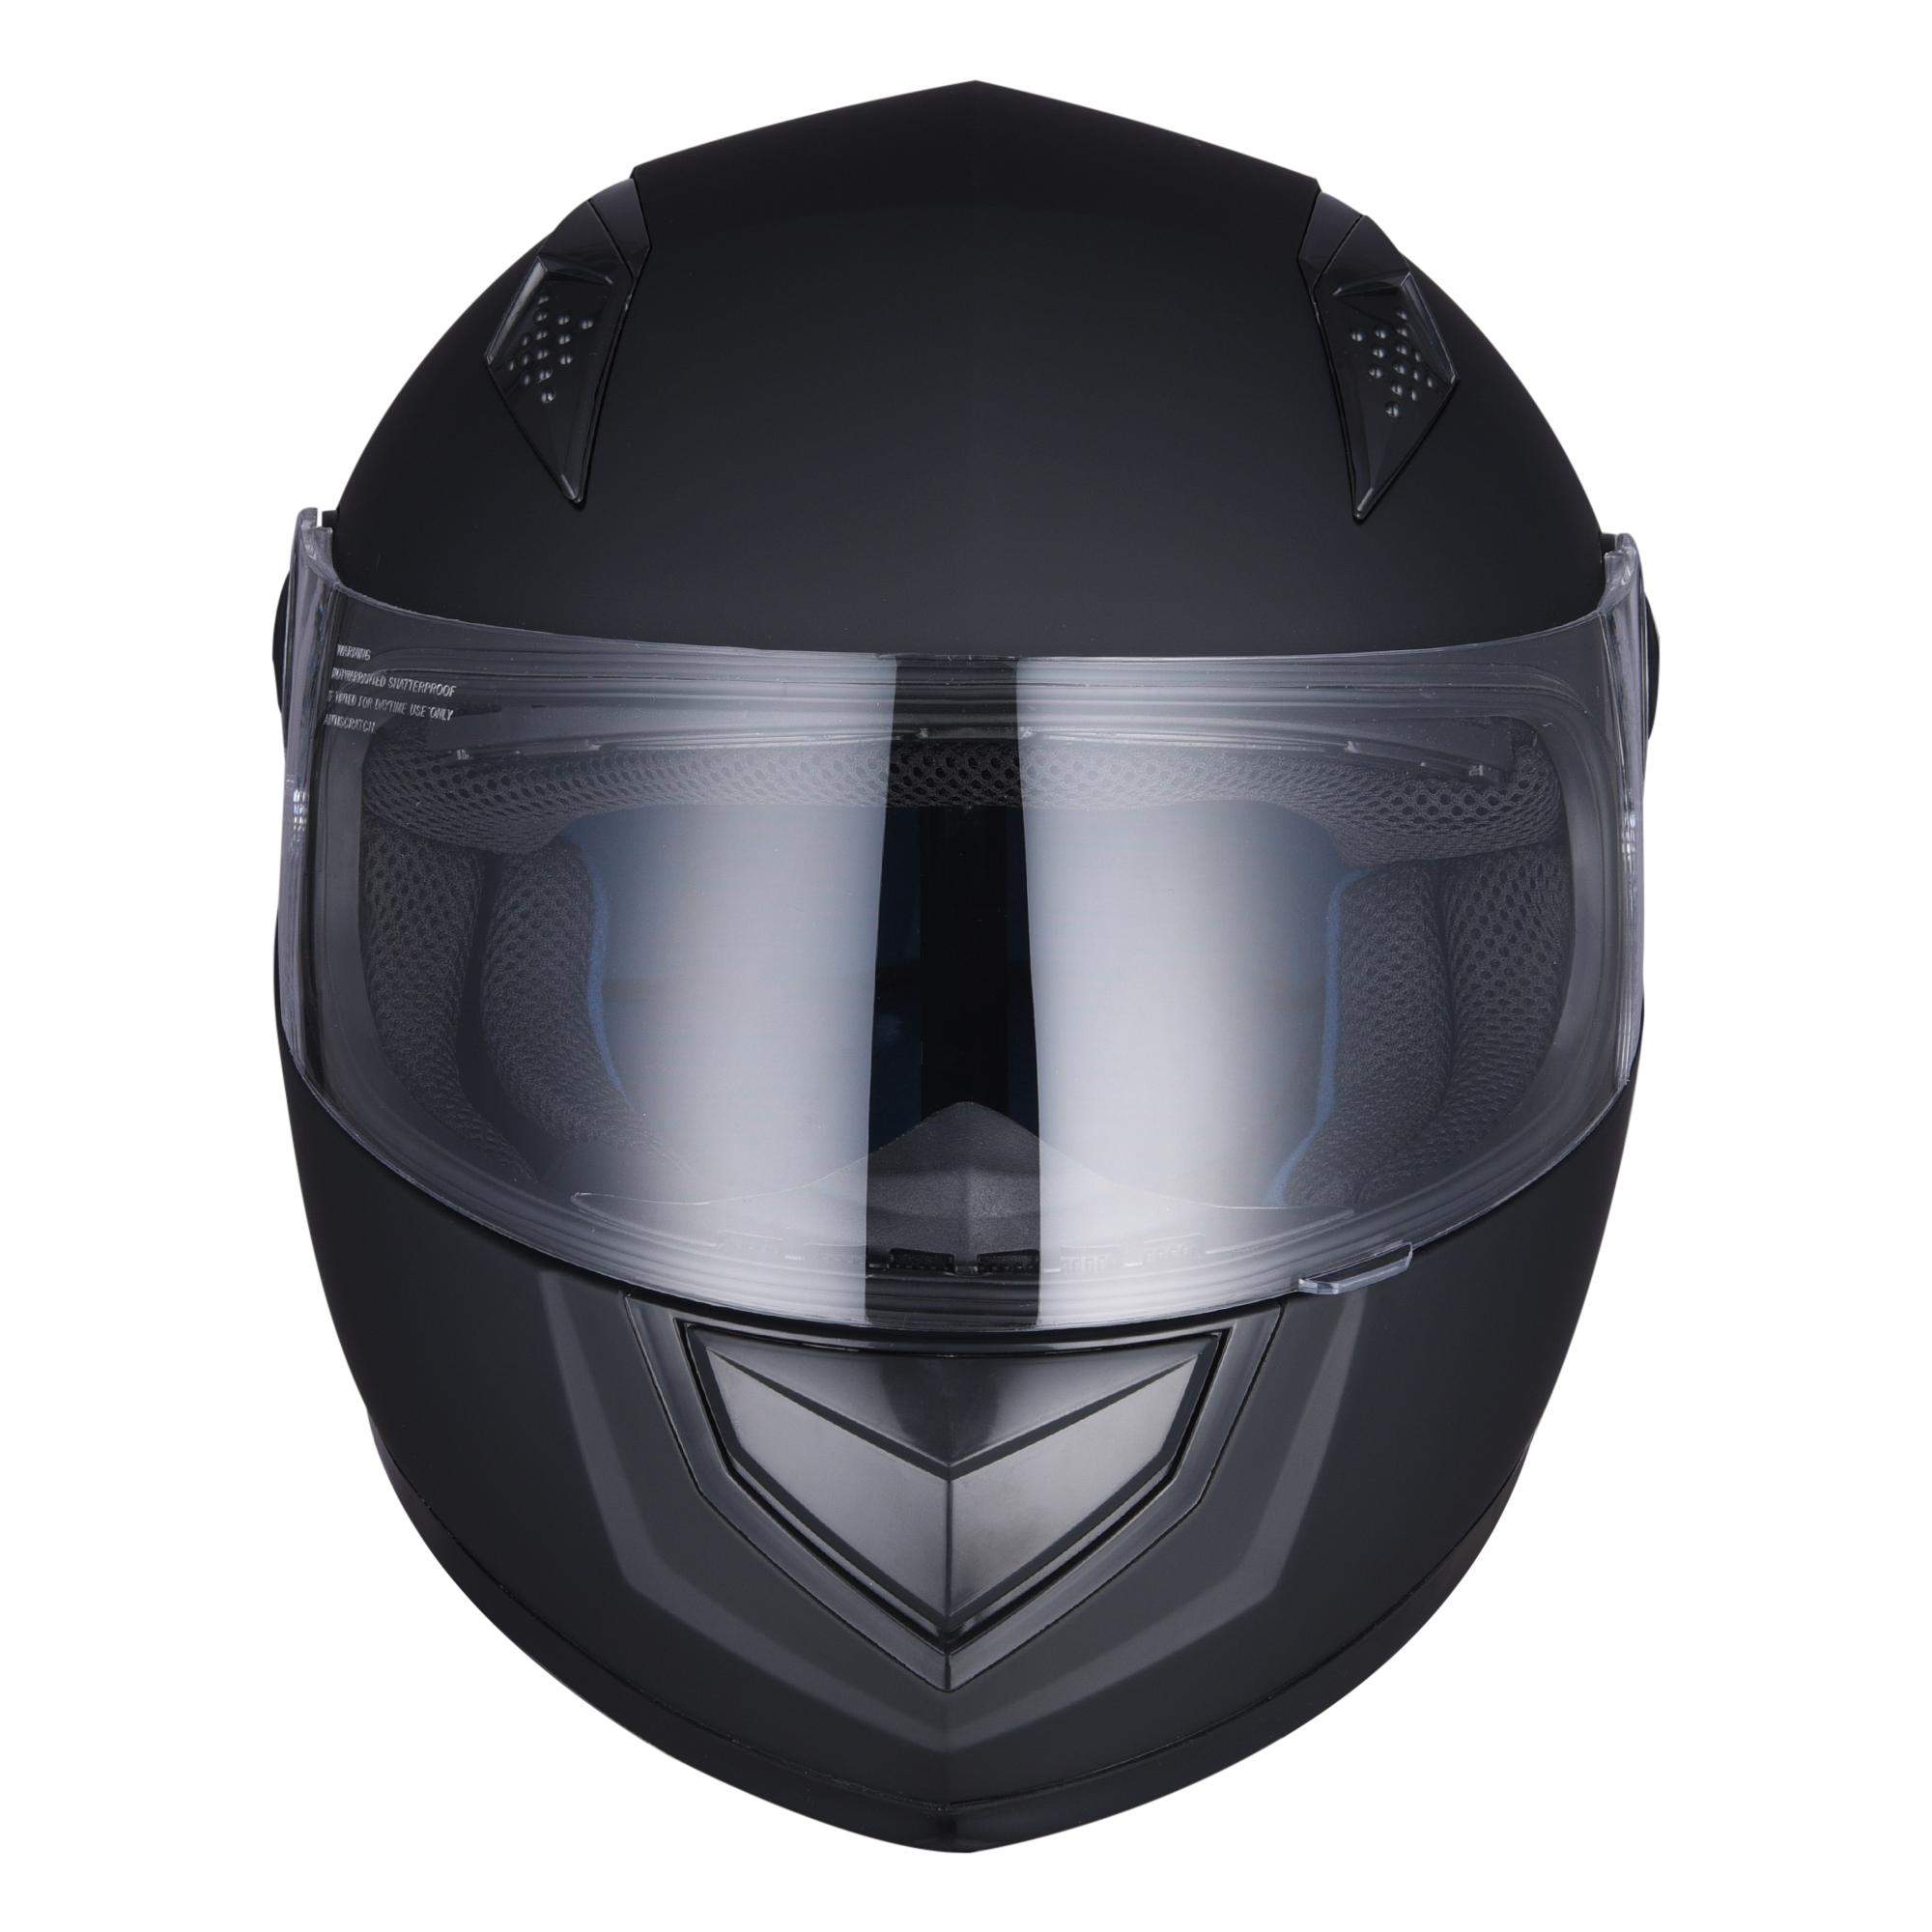 miniature 25 - AHR K12 Full Face Motorcycle Helmet DOT Air Vents Clear Visor Racing S M L XL